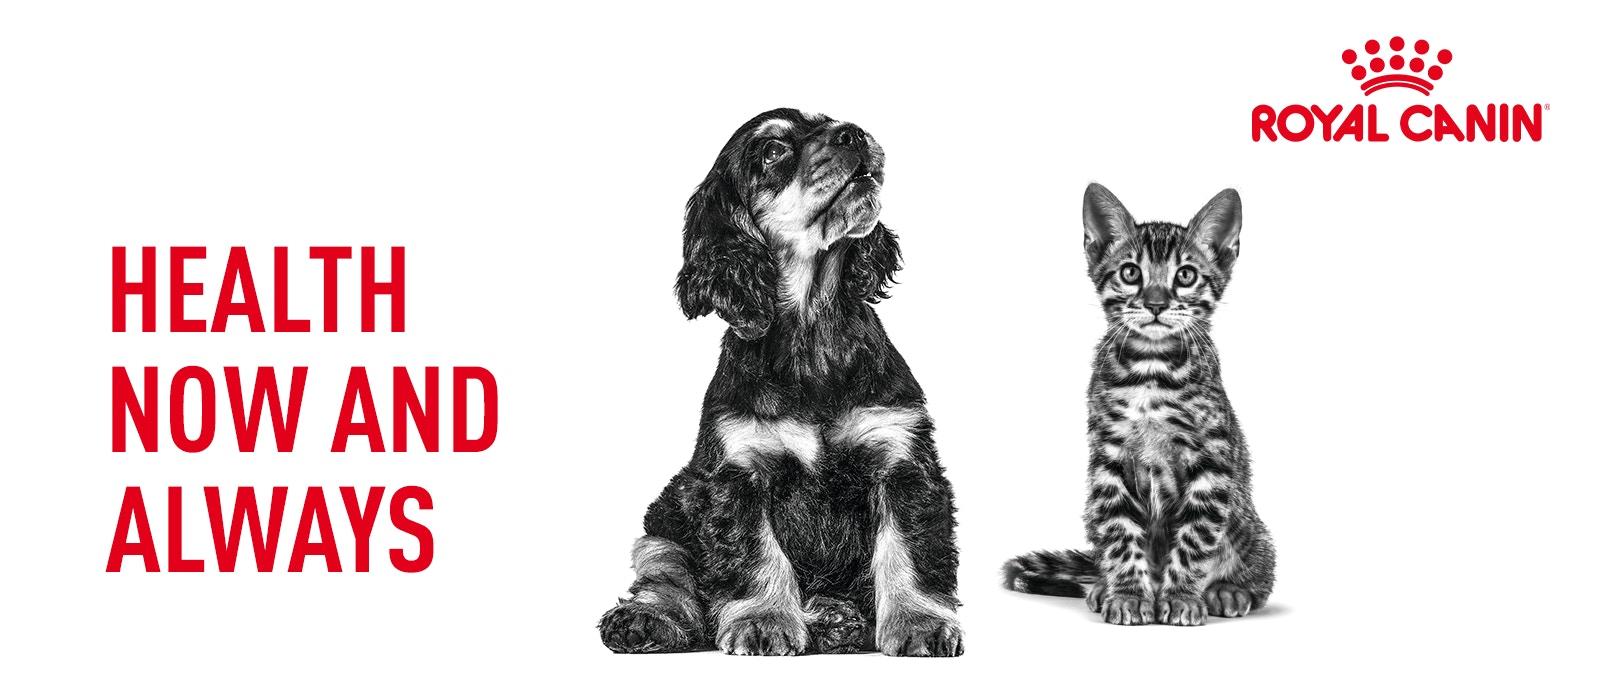 shop royal canin pet food on bondi pet